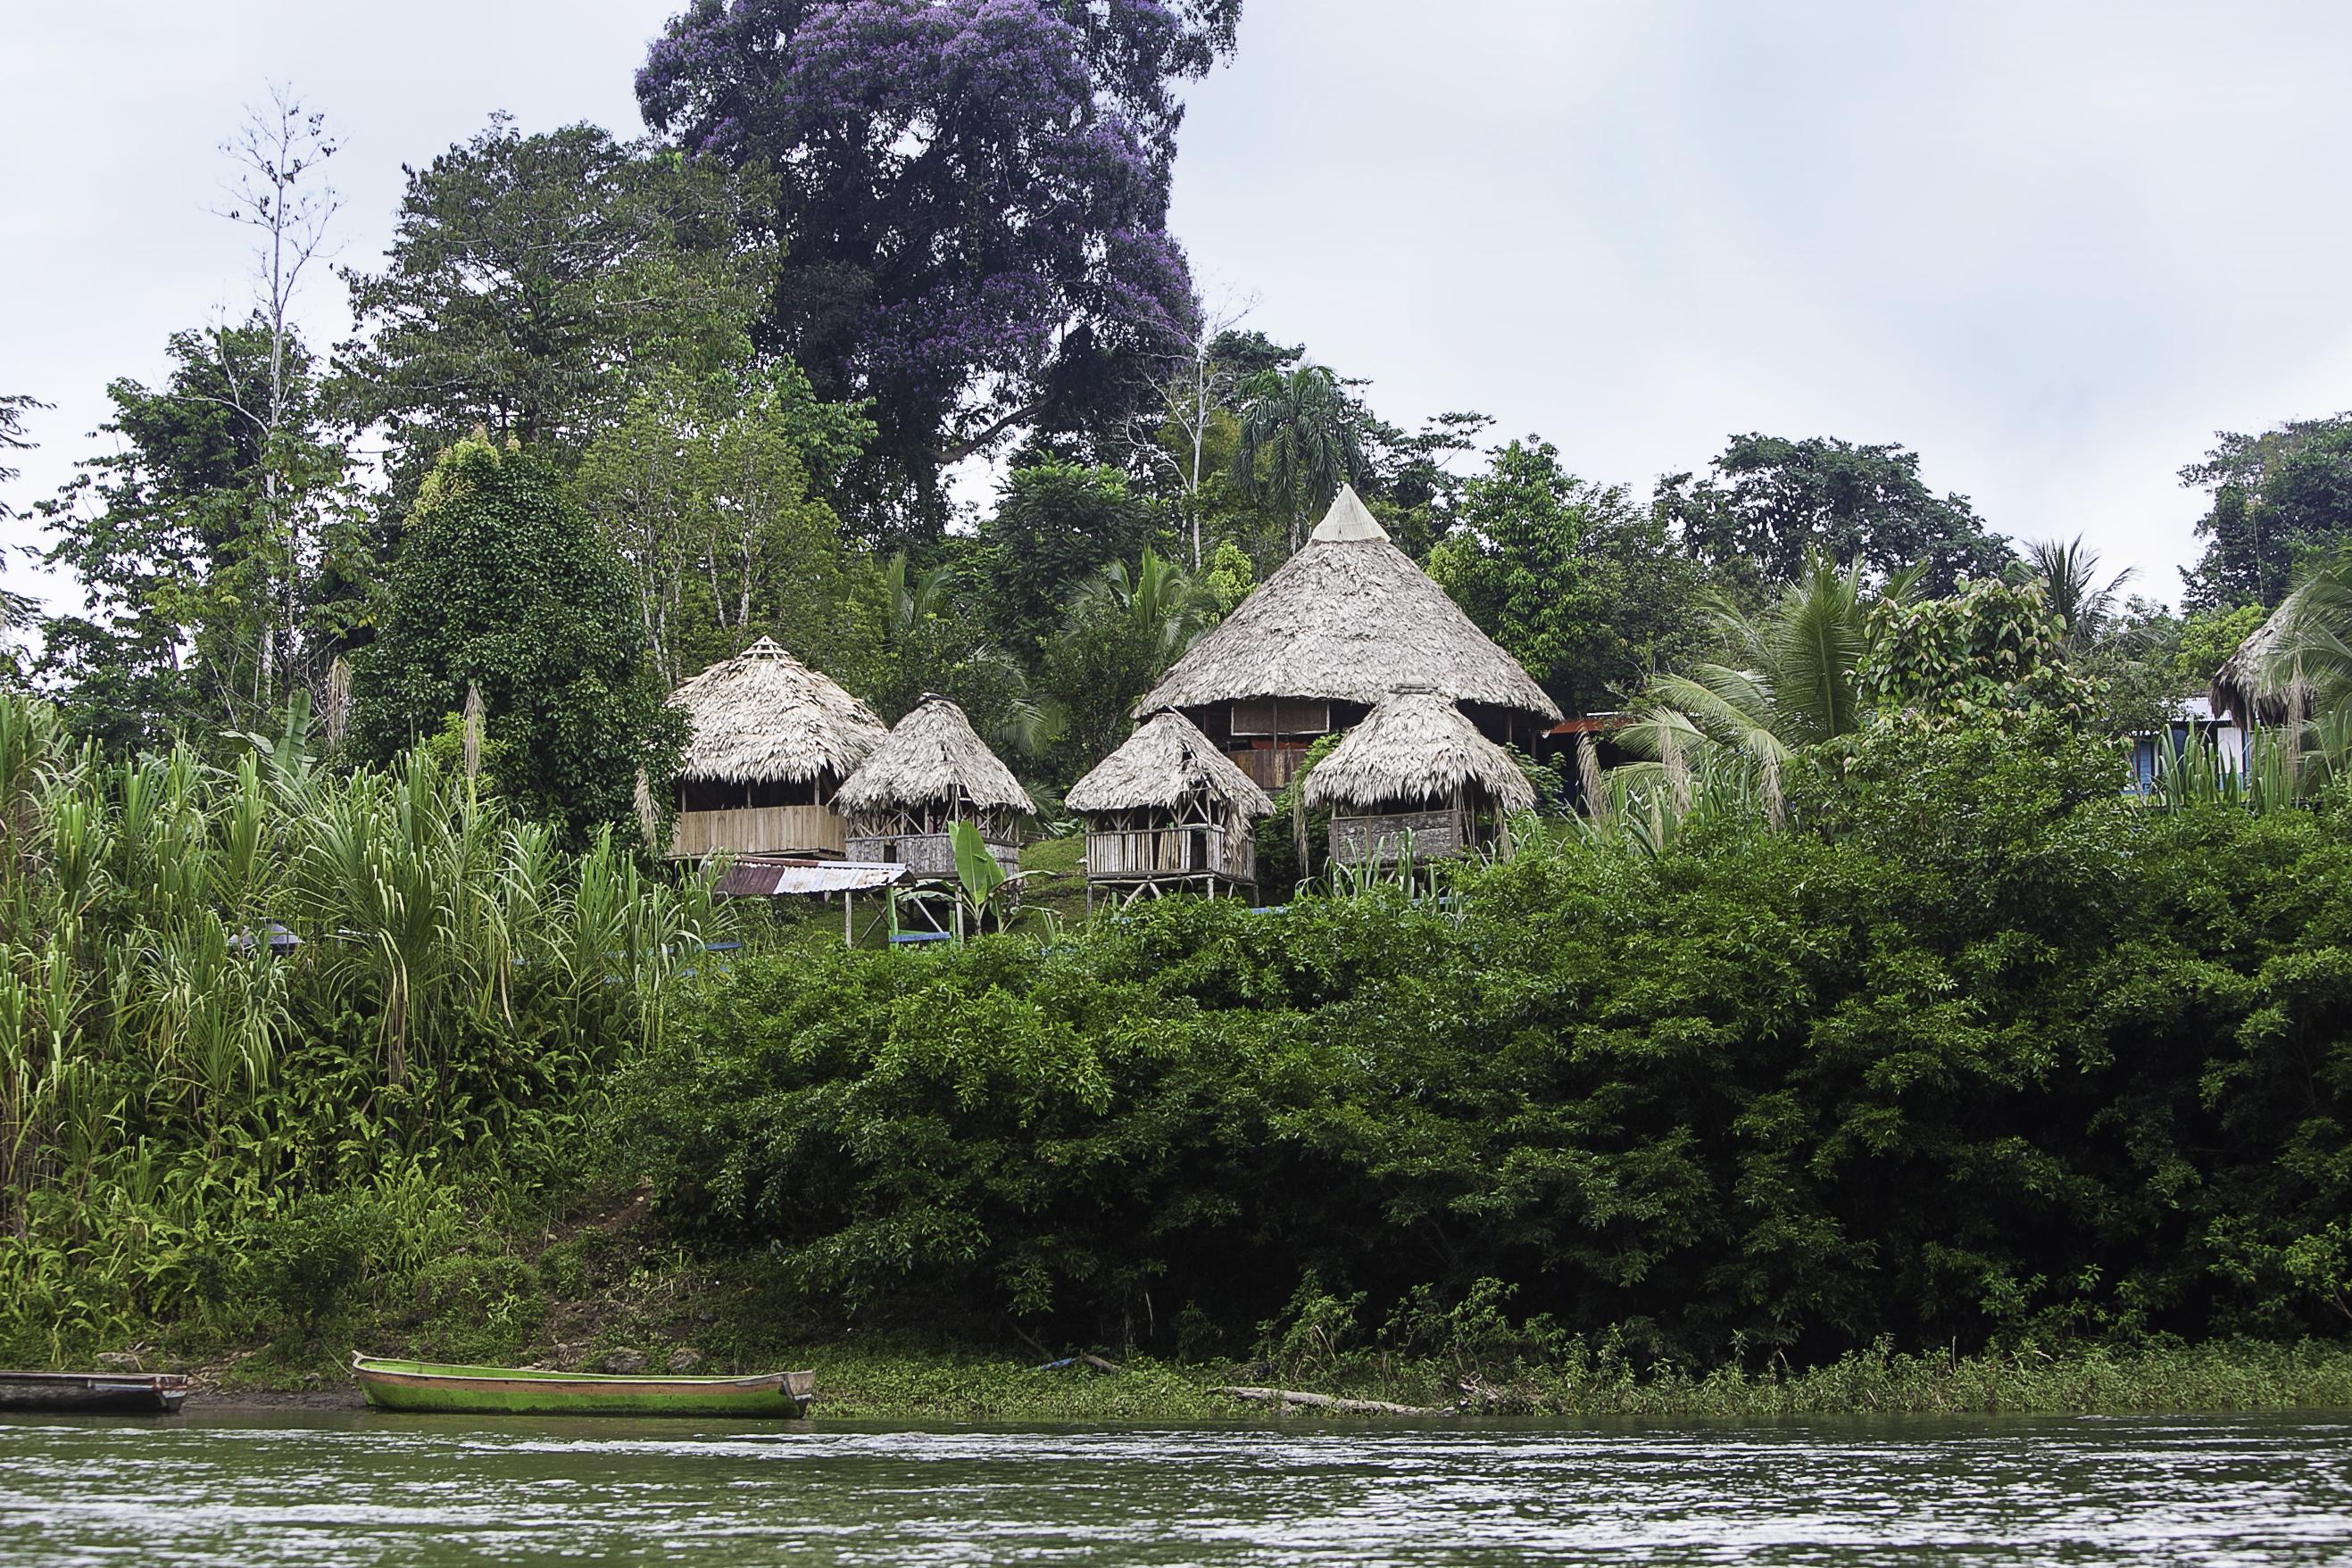 community of Yorkin, Costa Rica